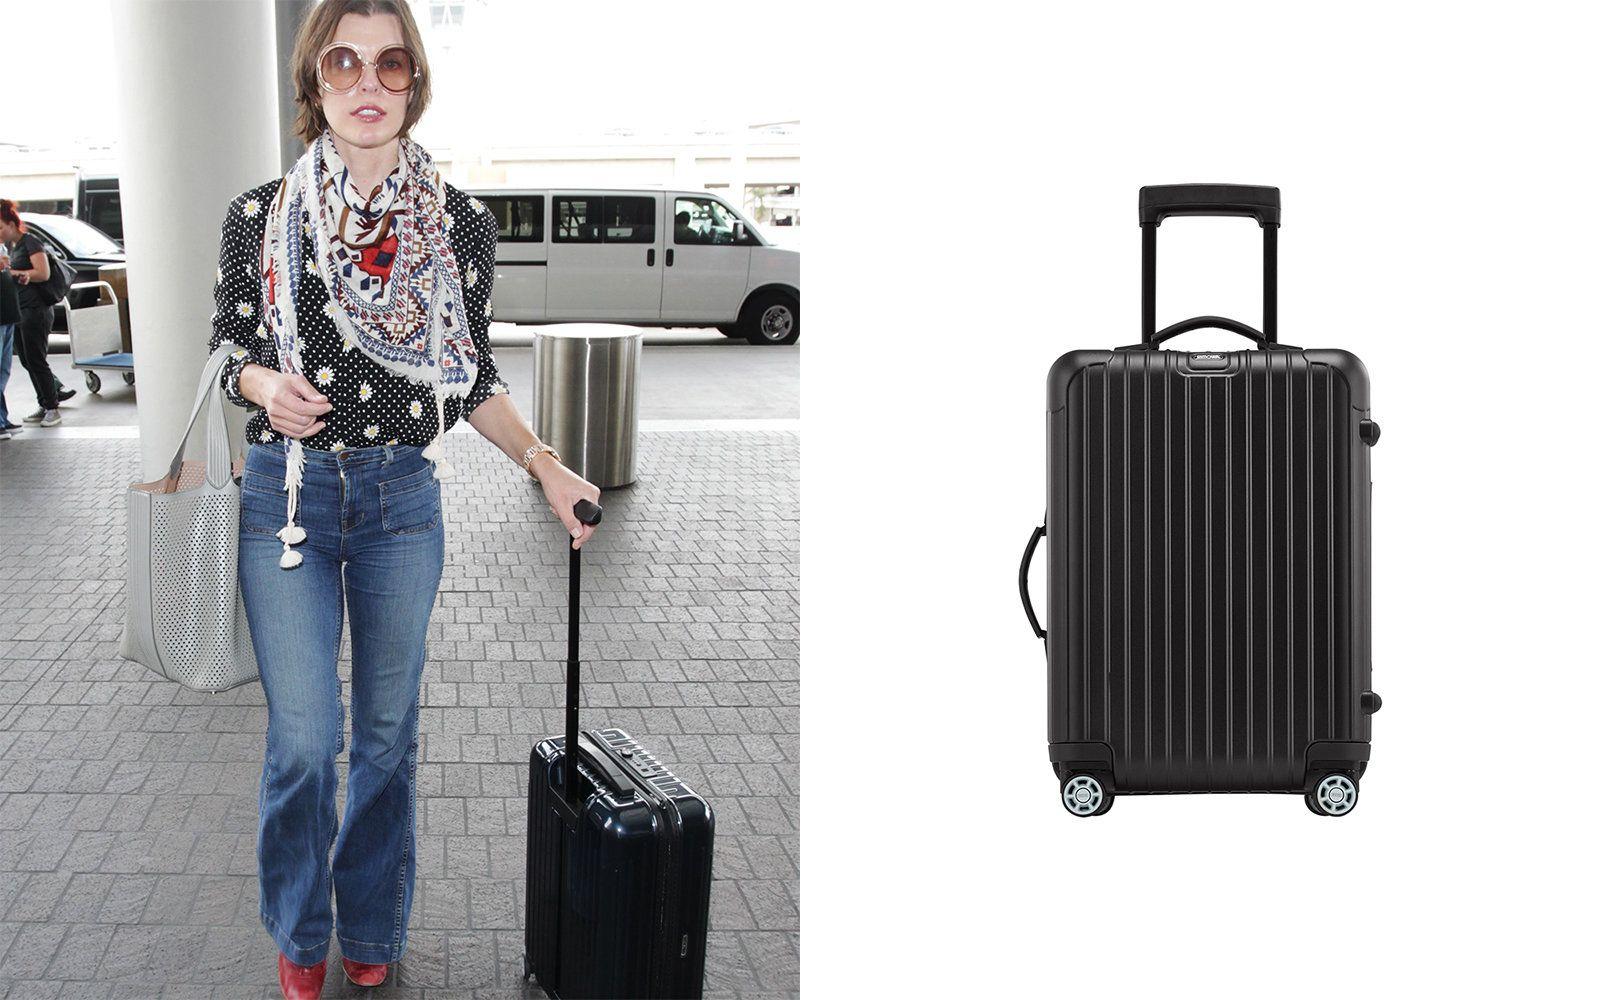 db26d583b19 9 Luggage Brands Celebrities Swear By   Let's Get Away!   Celebrity ...